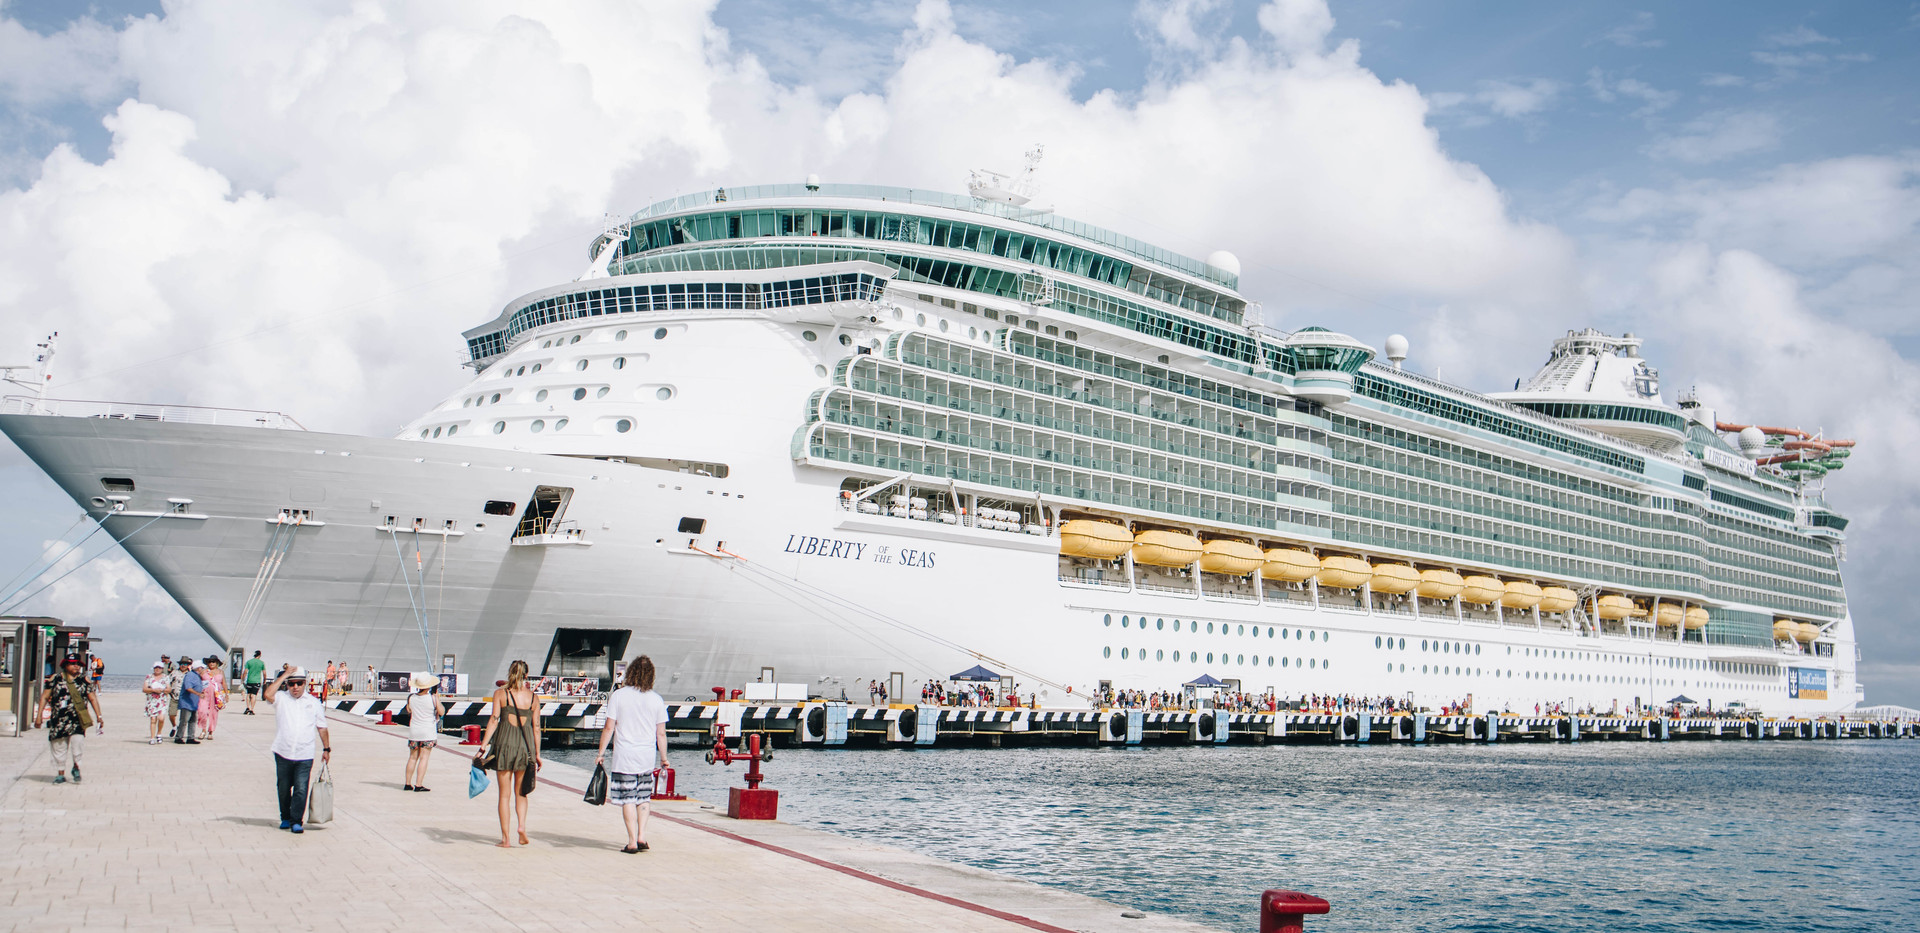 Royal Caribbean, Cozmel Mexico